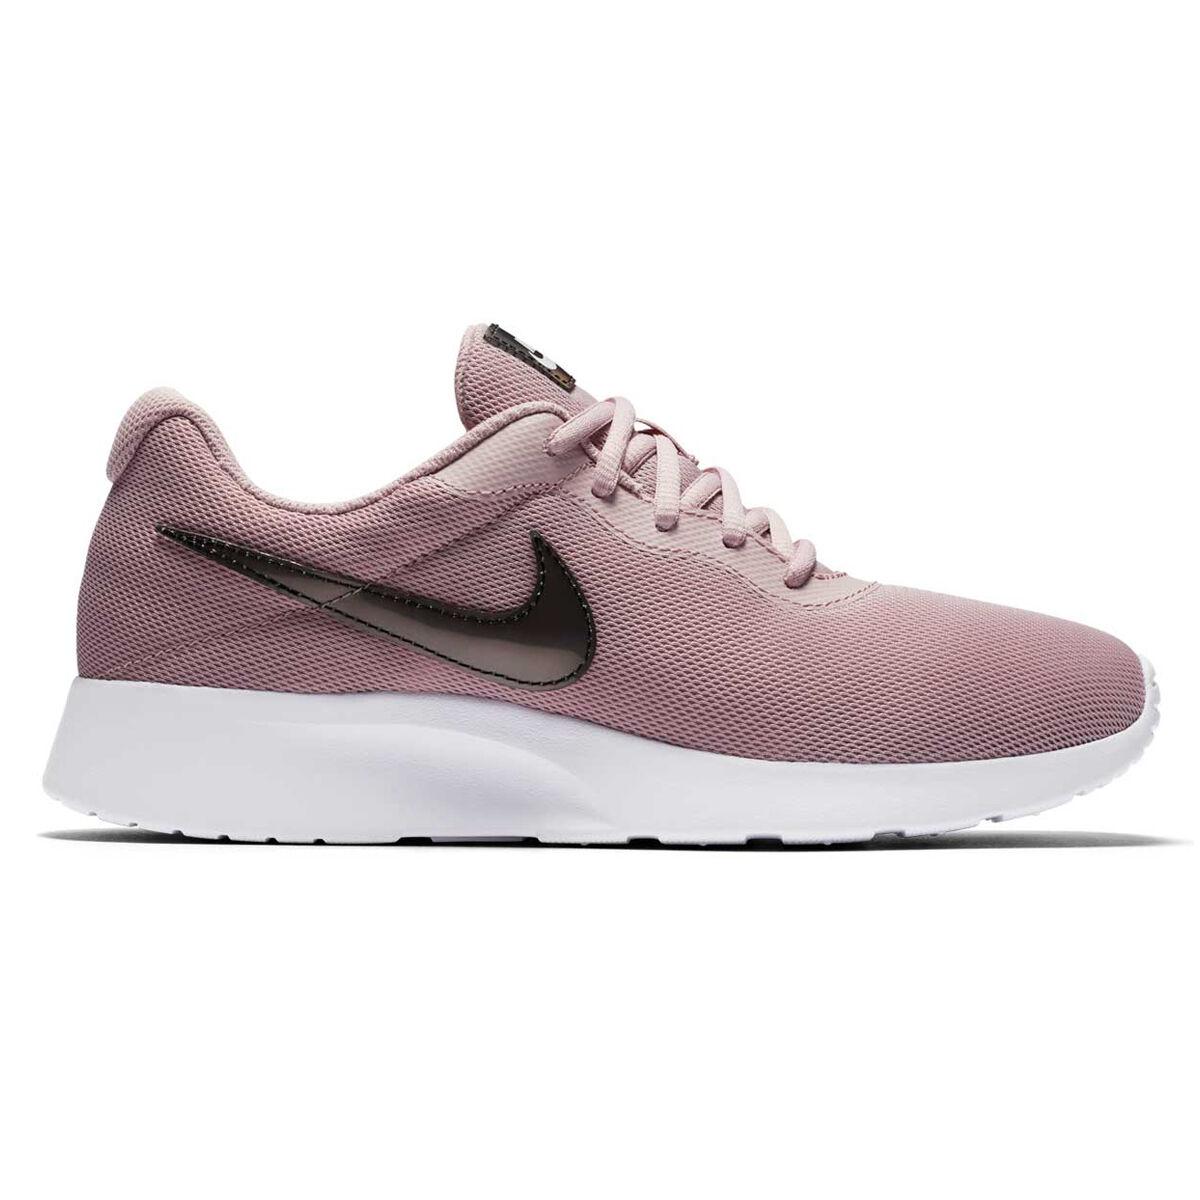 Shoptagr | Women's Tanjun Sneaker So Comfy!Nike Tanjun